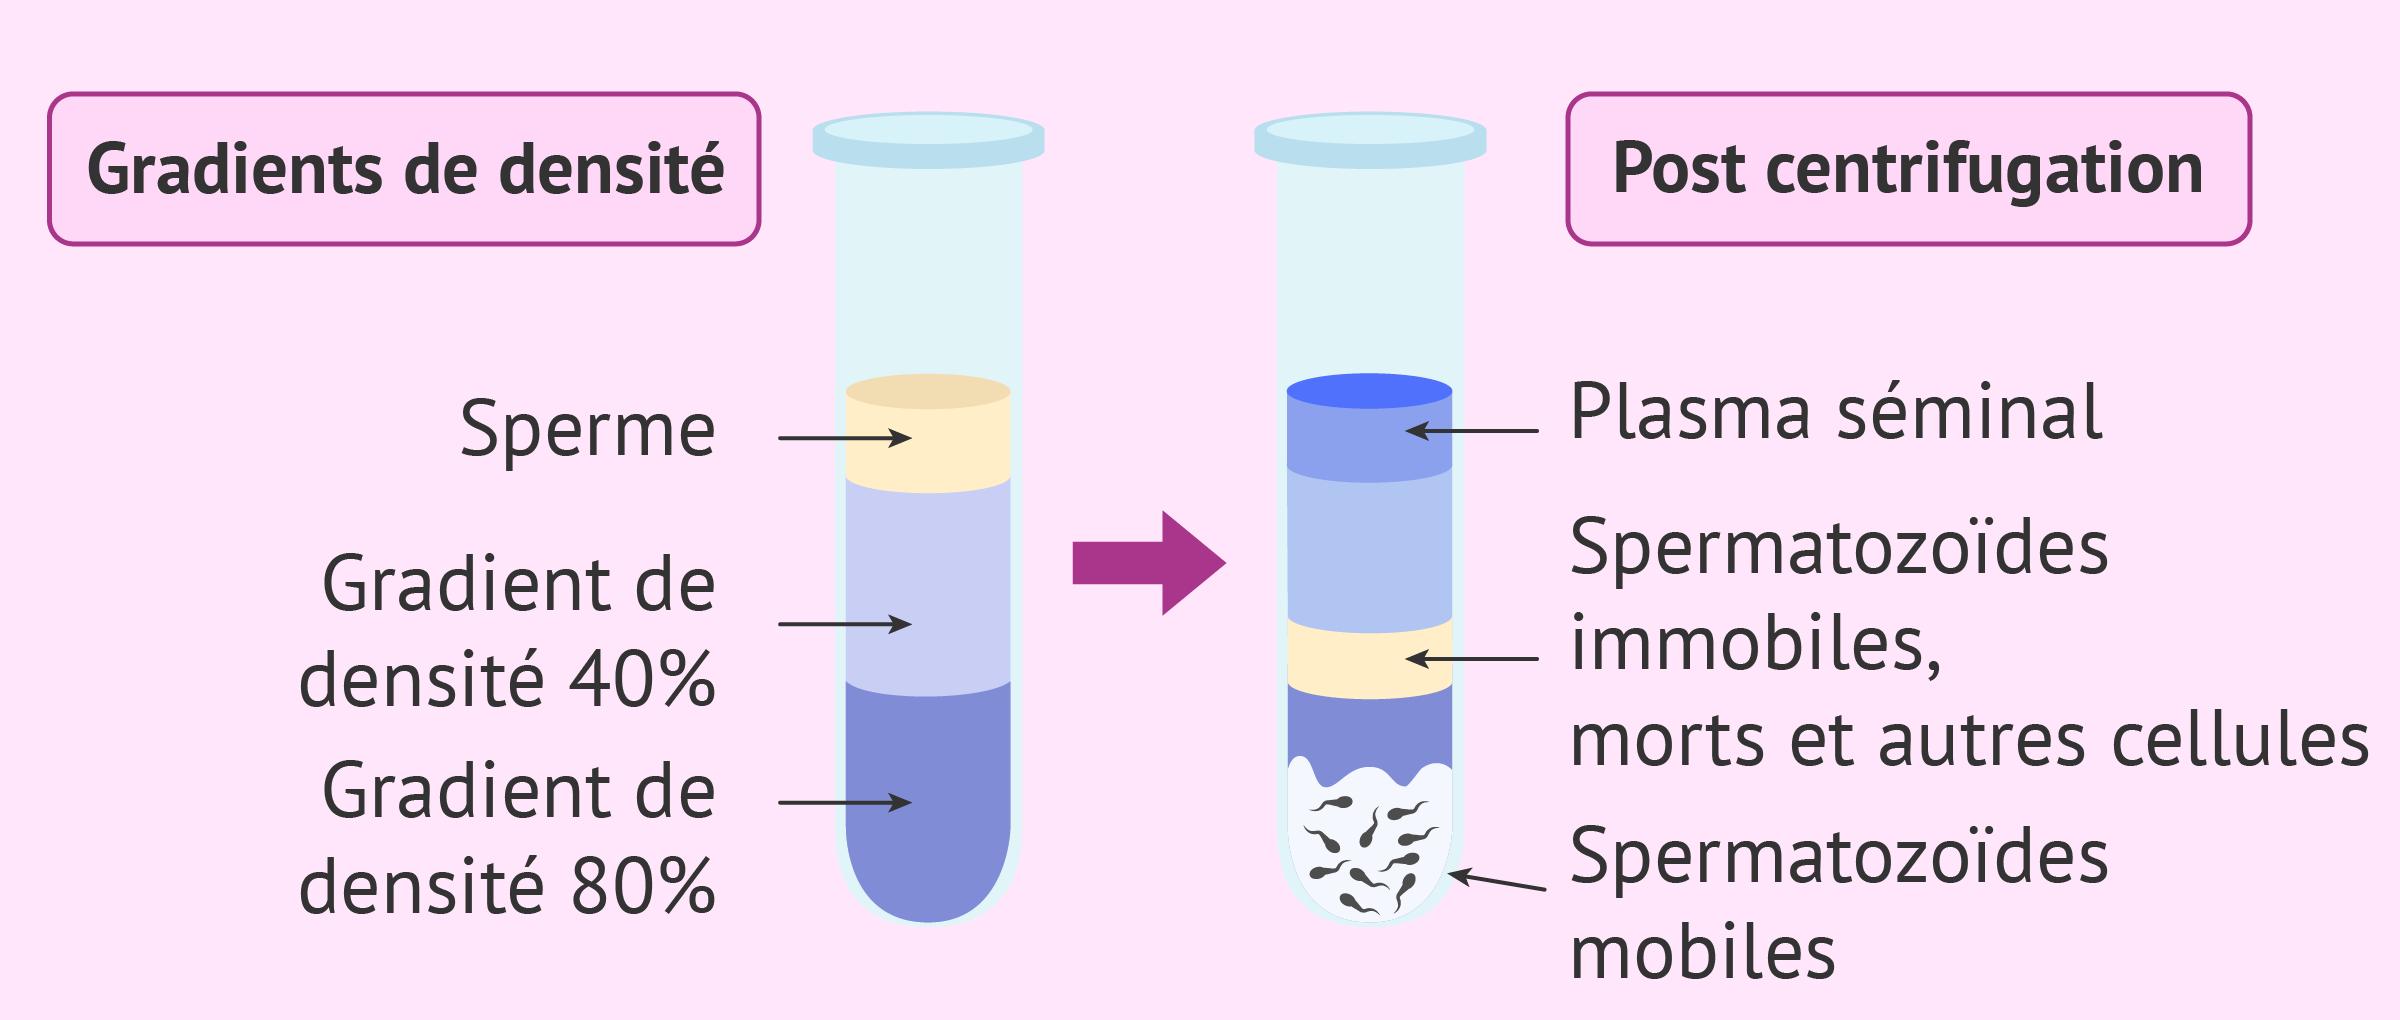 Capacitation du sperme